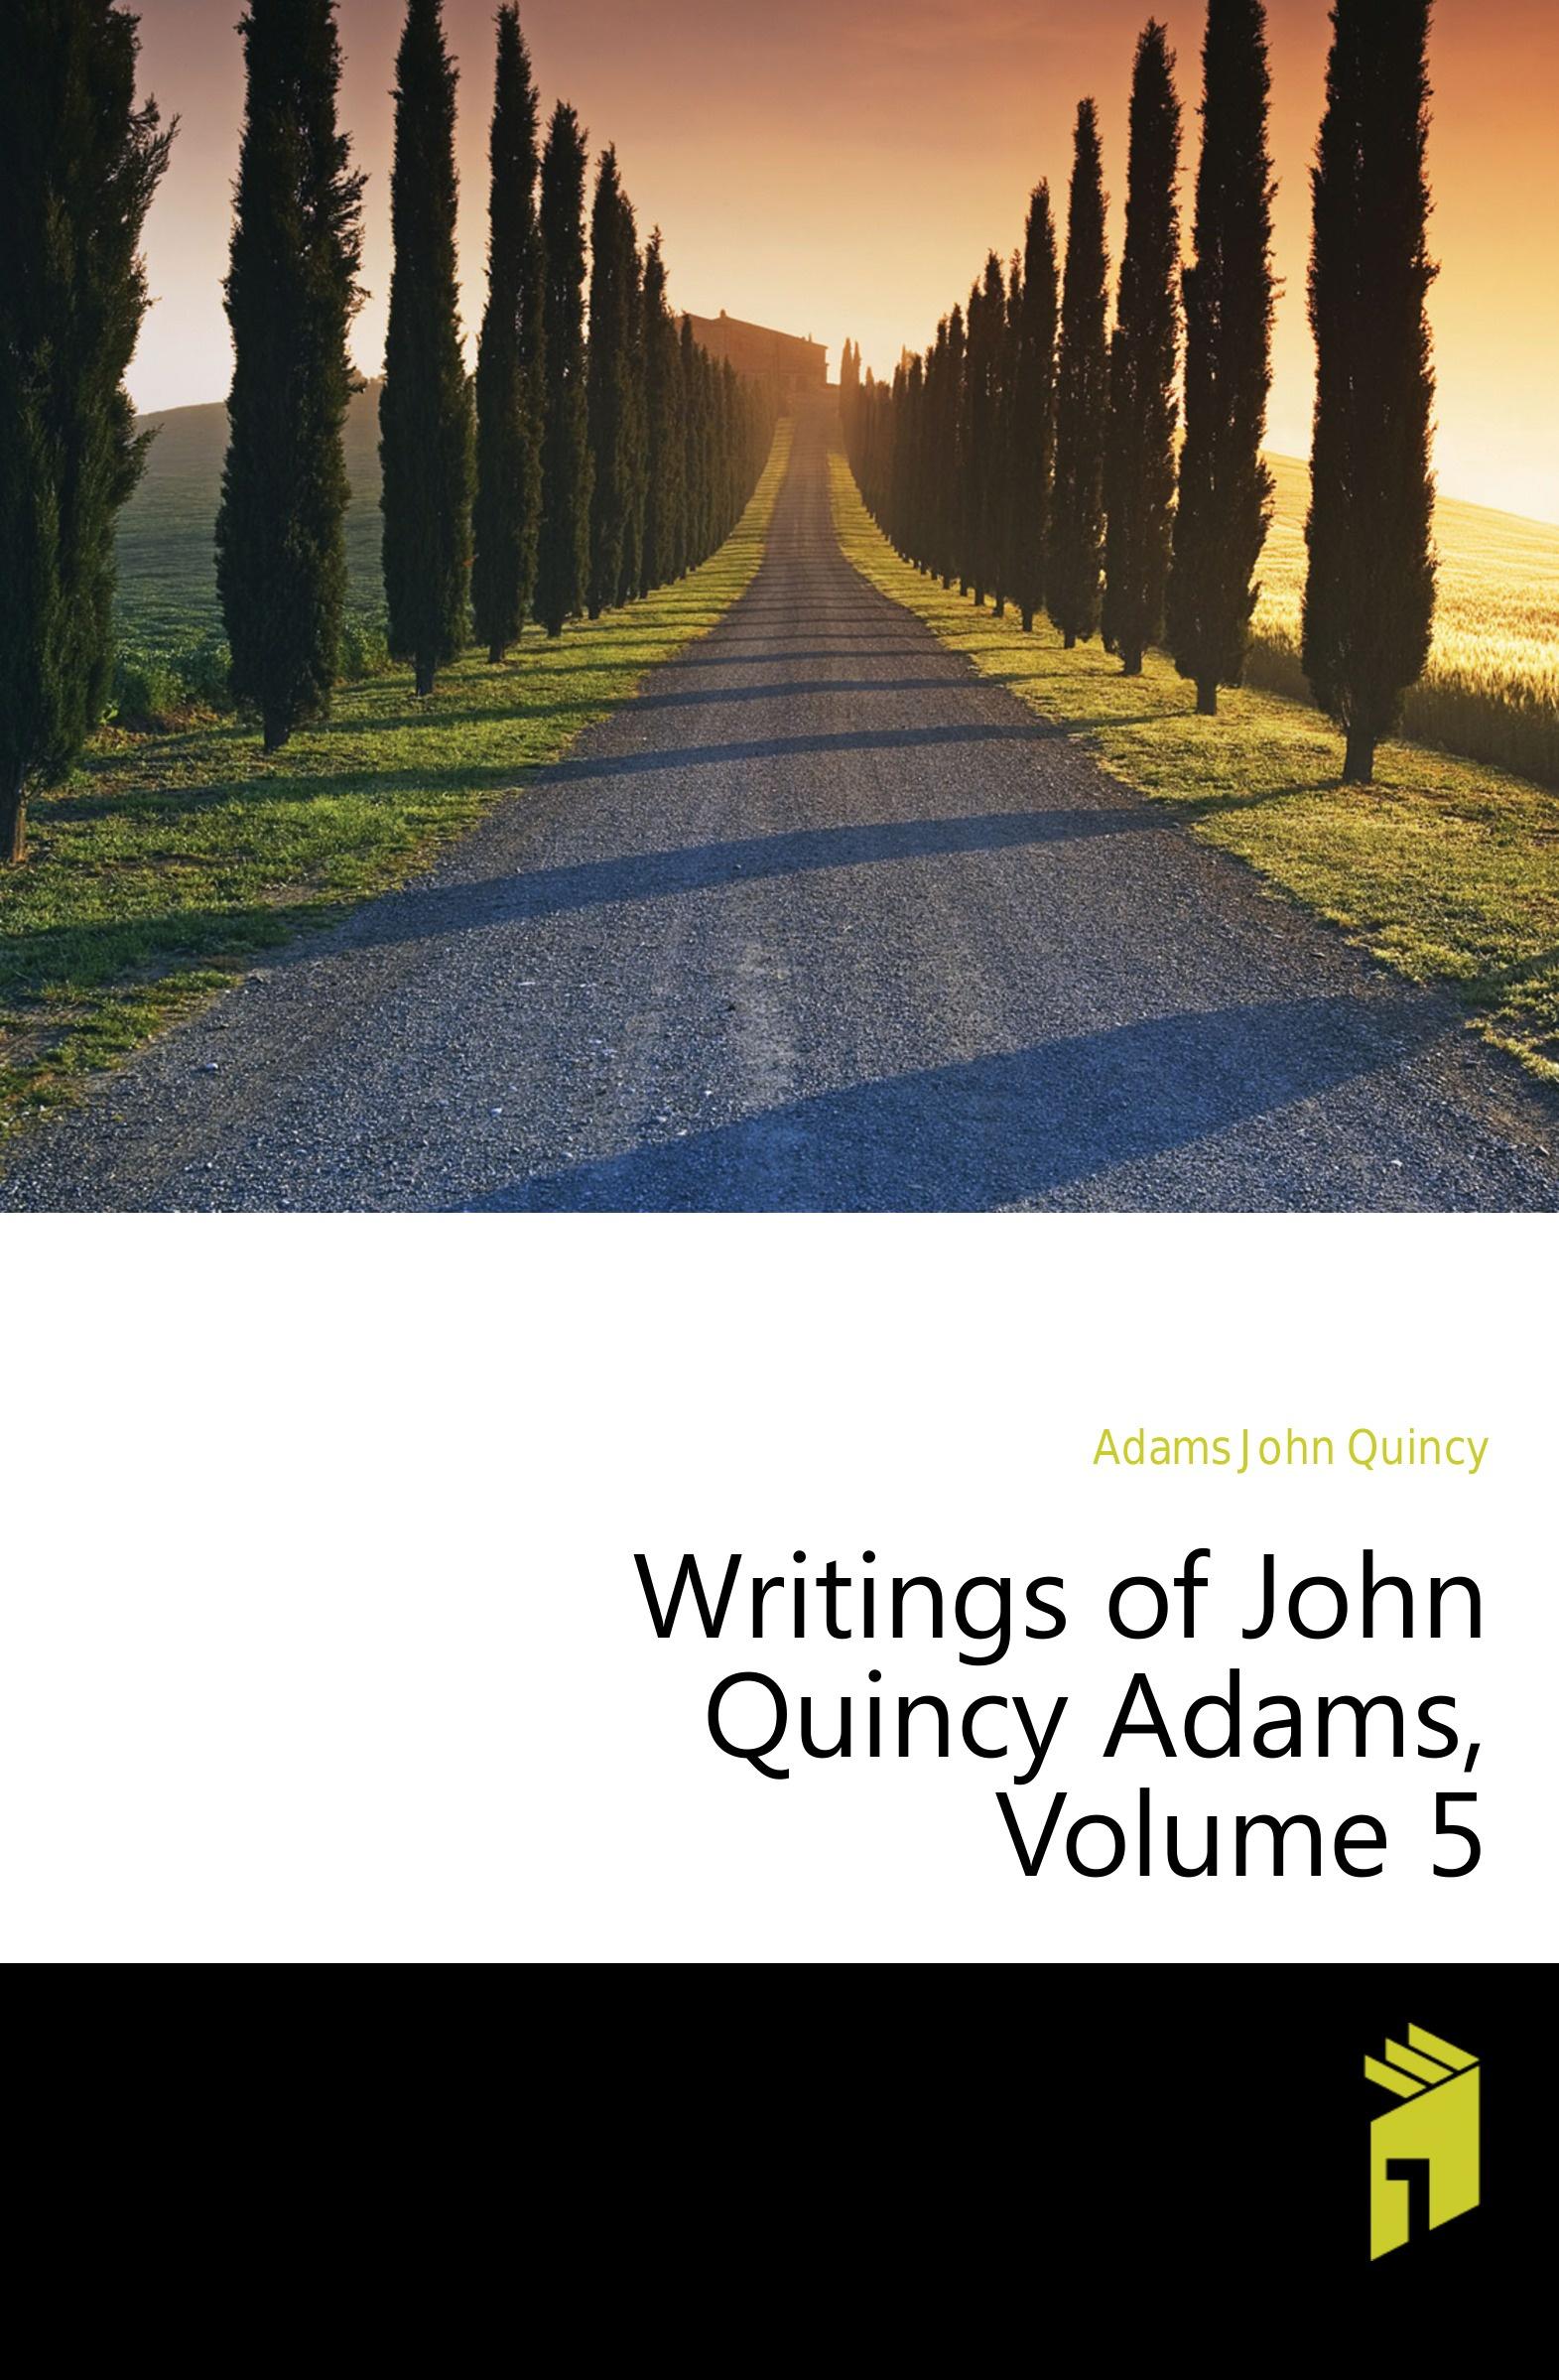 лучшая цена Adams John Quincy Writings of John Quincy Adams, Volume 5